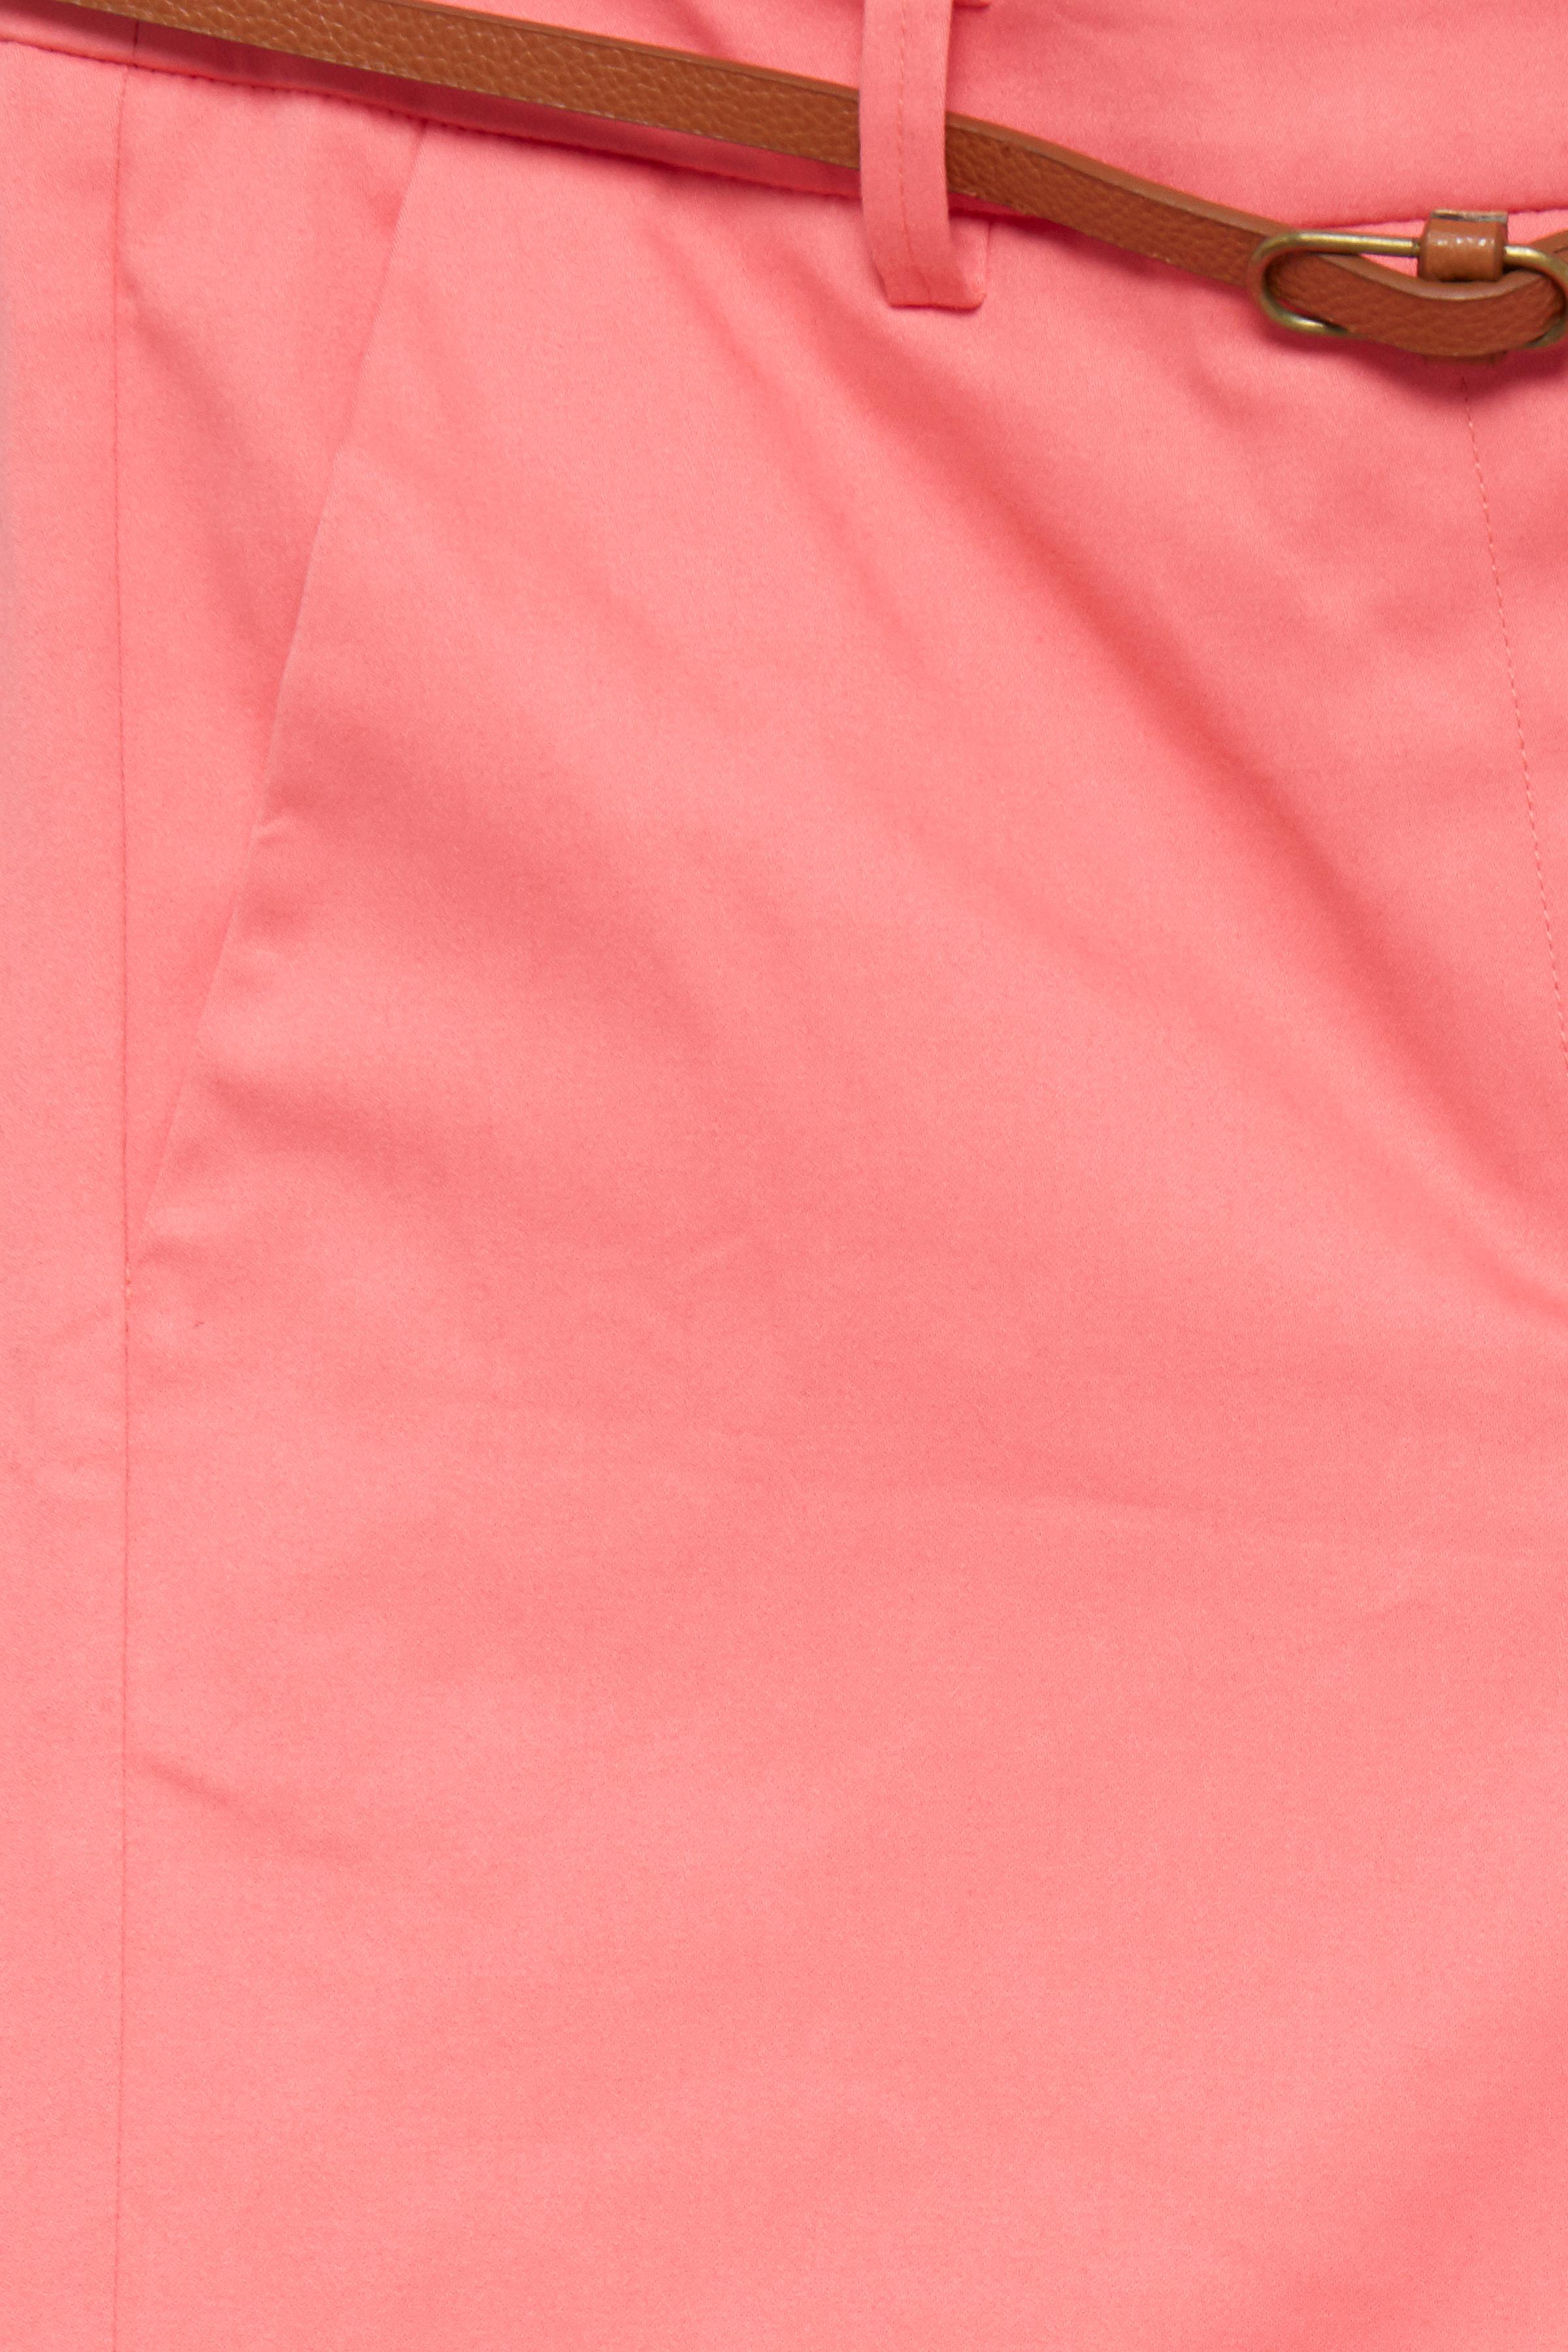 Sunkist Coral Pants Suiting van b.young – Koop Sunkist Coral Pants Suiting hier van size 34-46